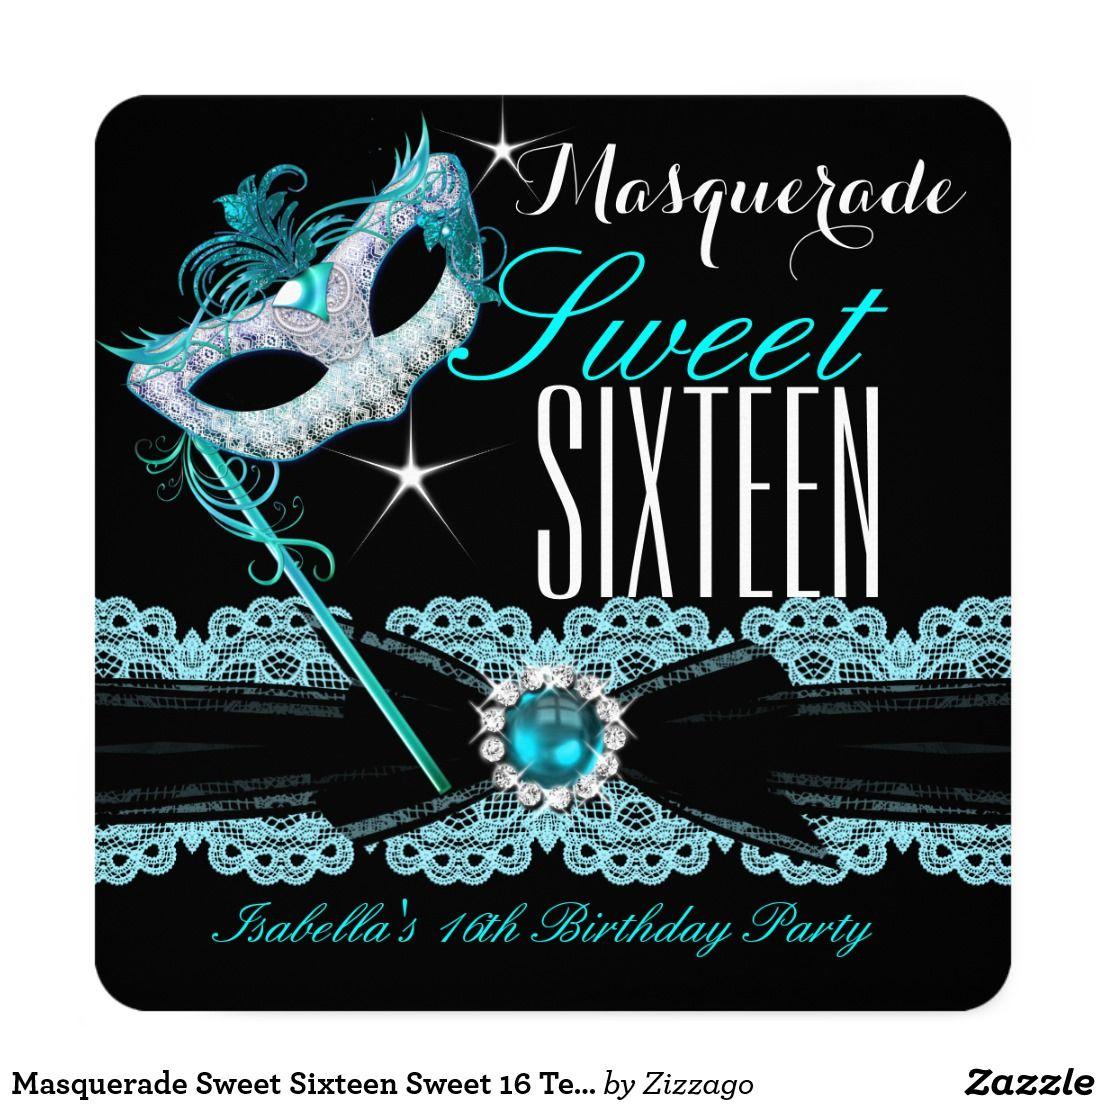 Masquerade Sweet Sixteen Sweet 16 Teal Blue 2 MASQUERADE SWEET